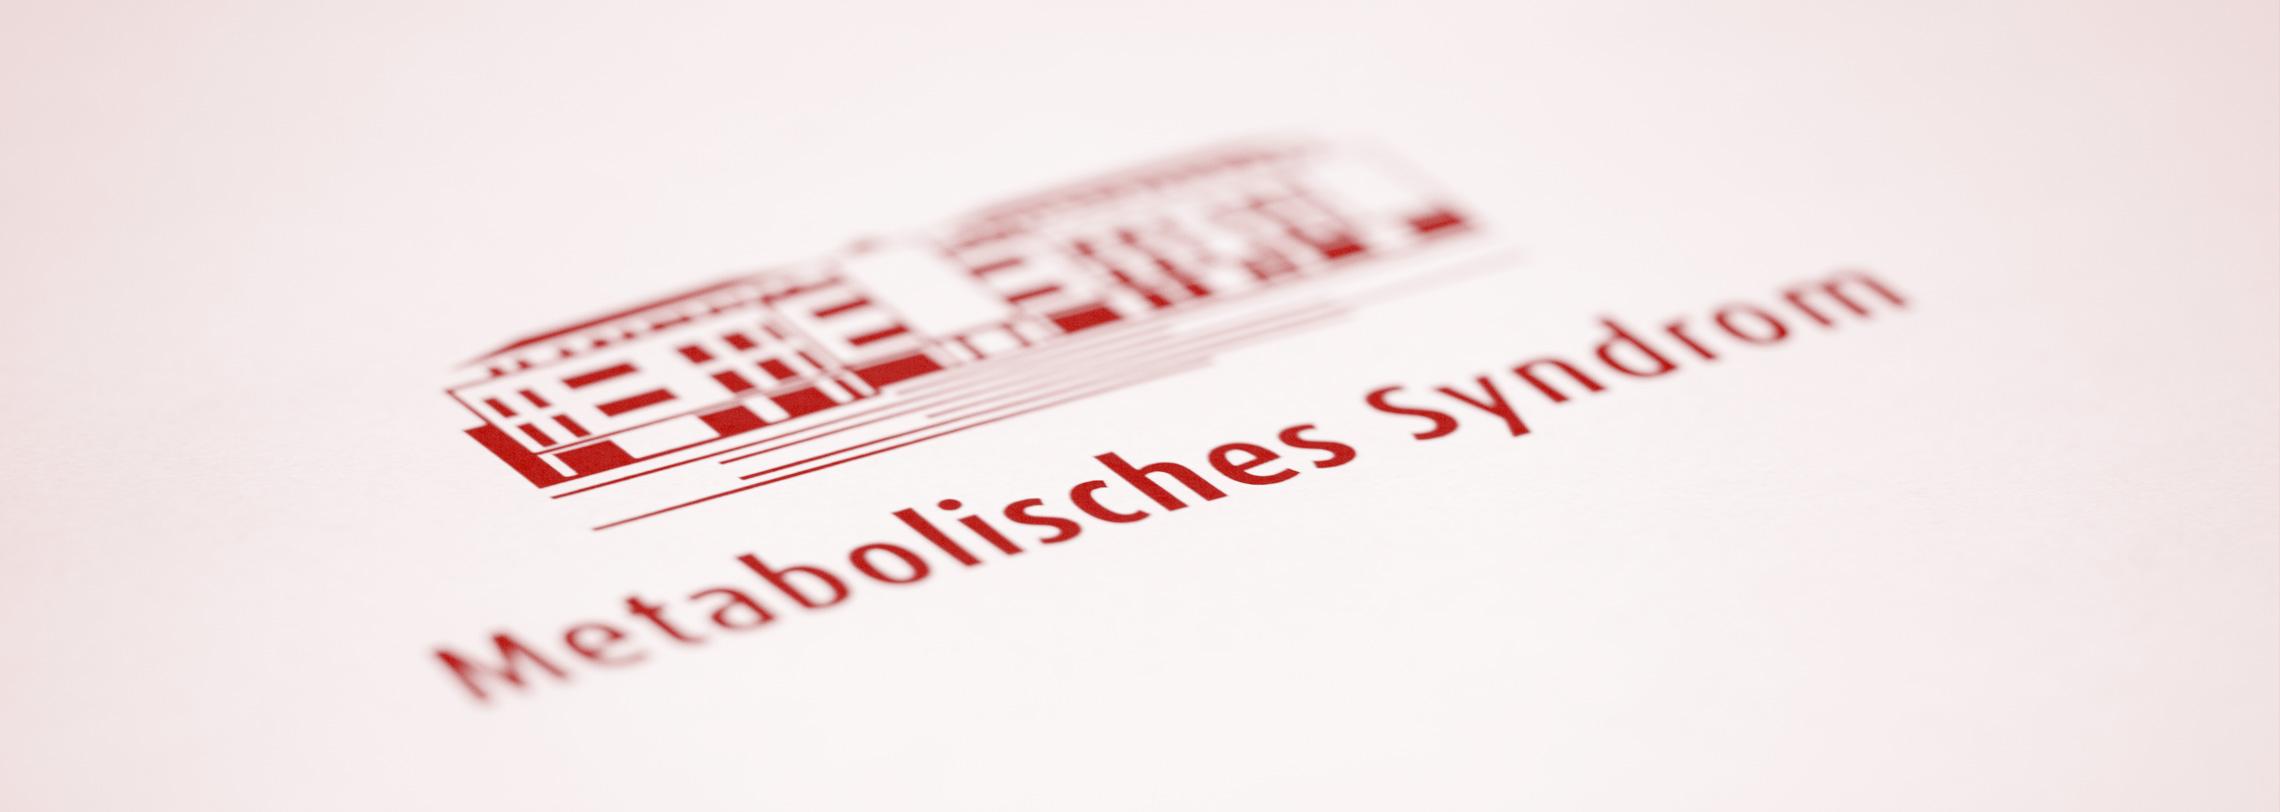 Methabolisches Syndrom Kardiologie Zehlendorf